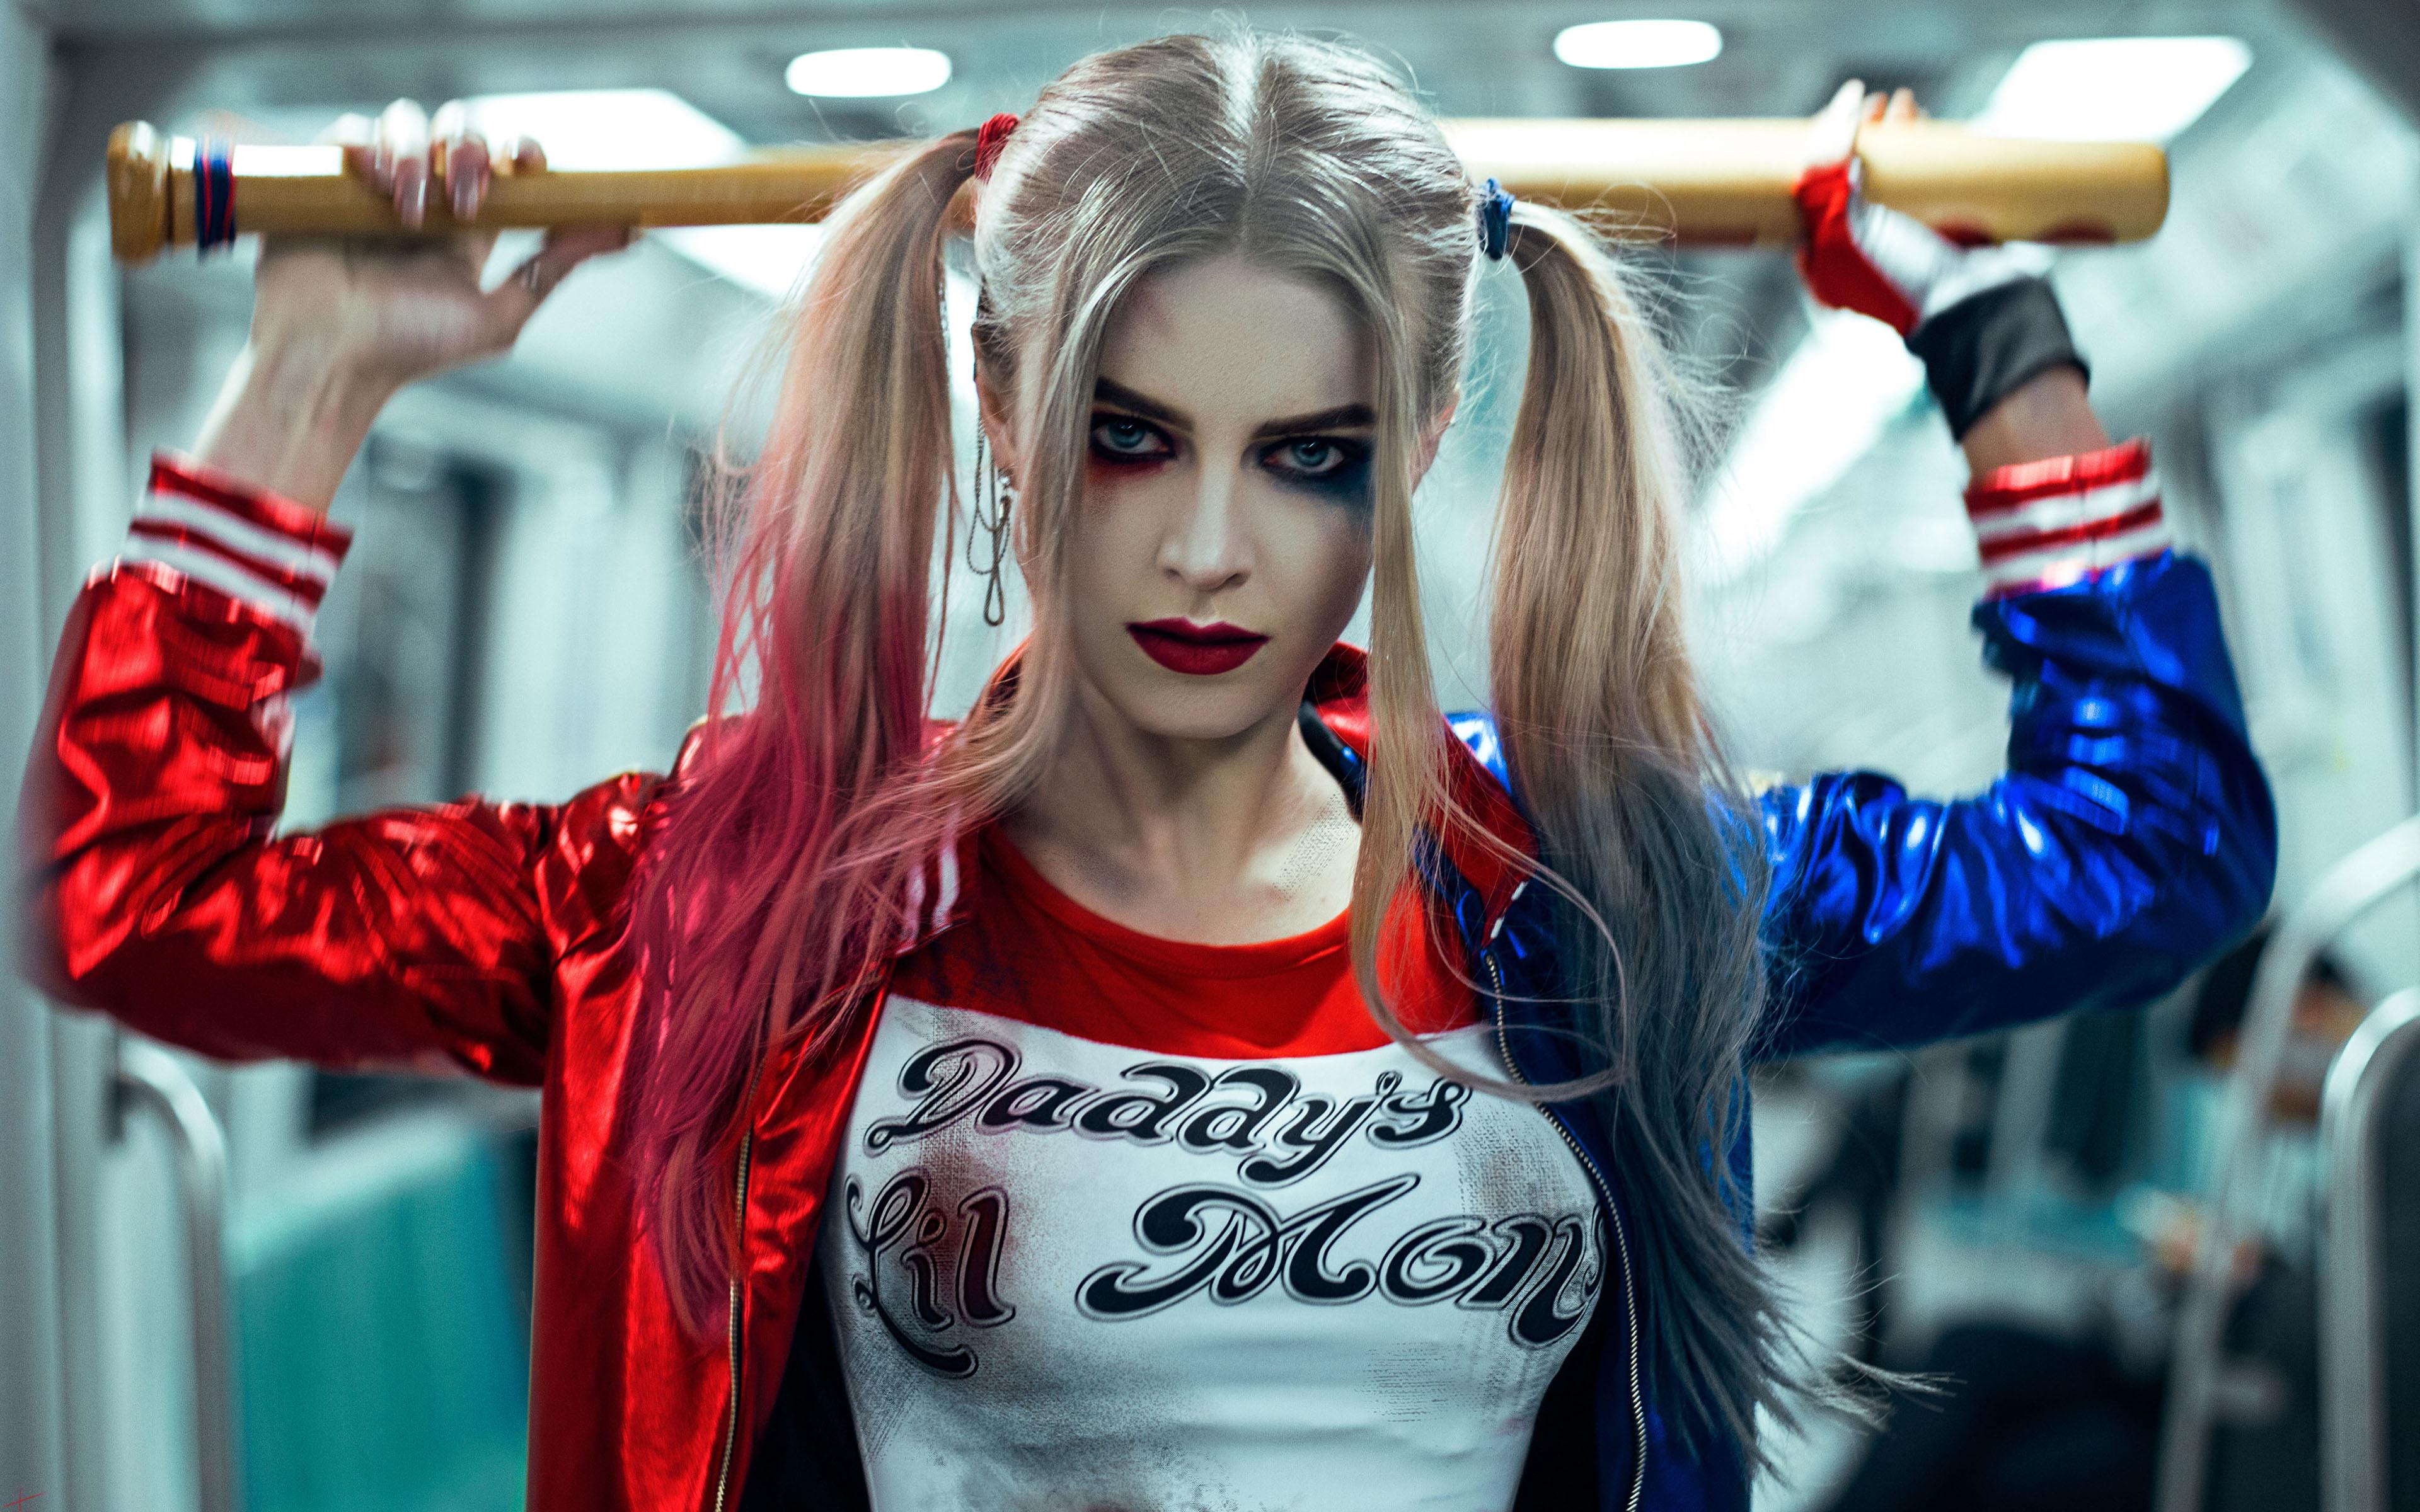 Cosplay Pubg Girl Hd Wallpaper: Harley Quinn 4k Ultra HD Wallpaper